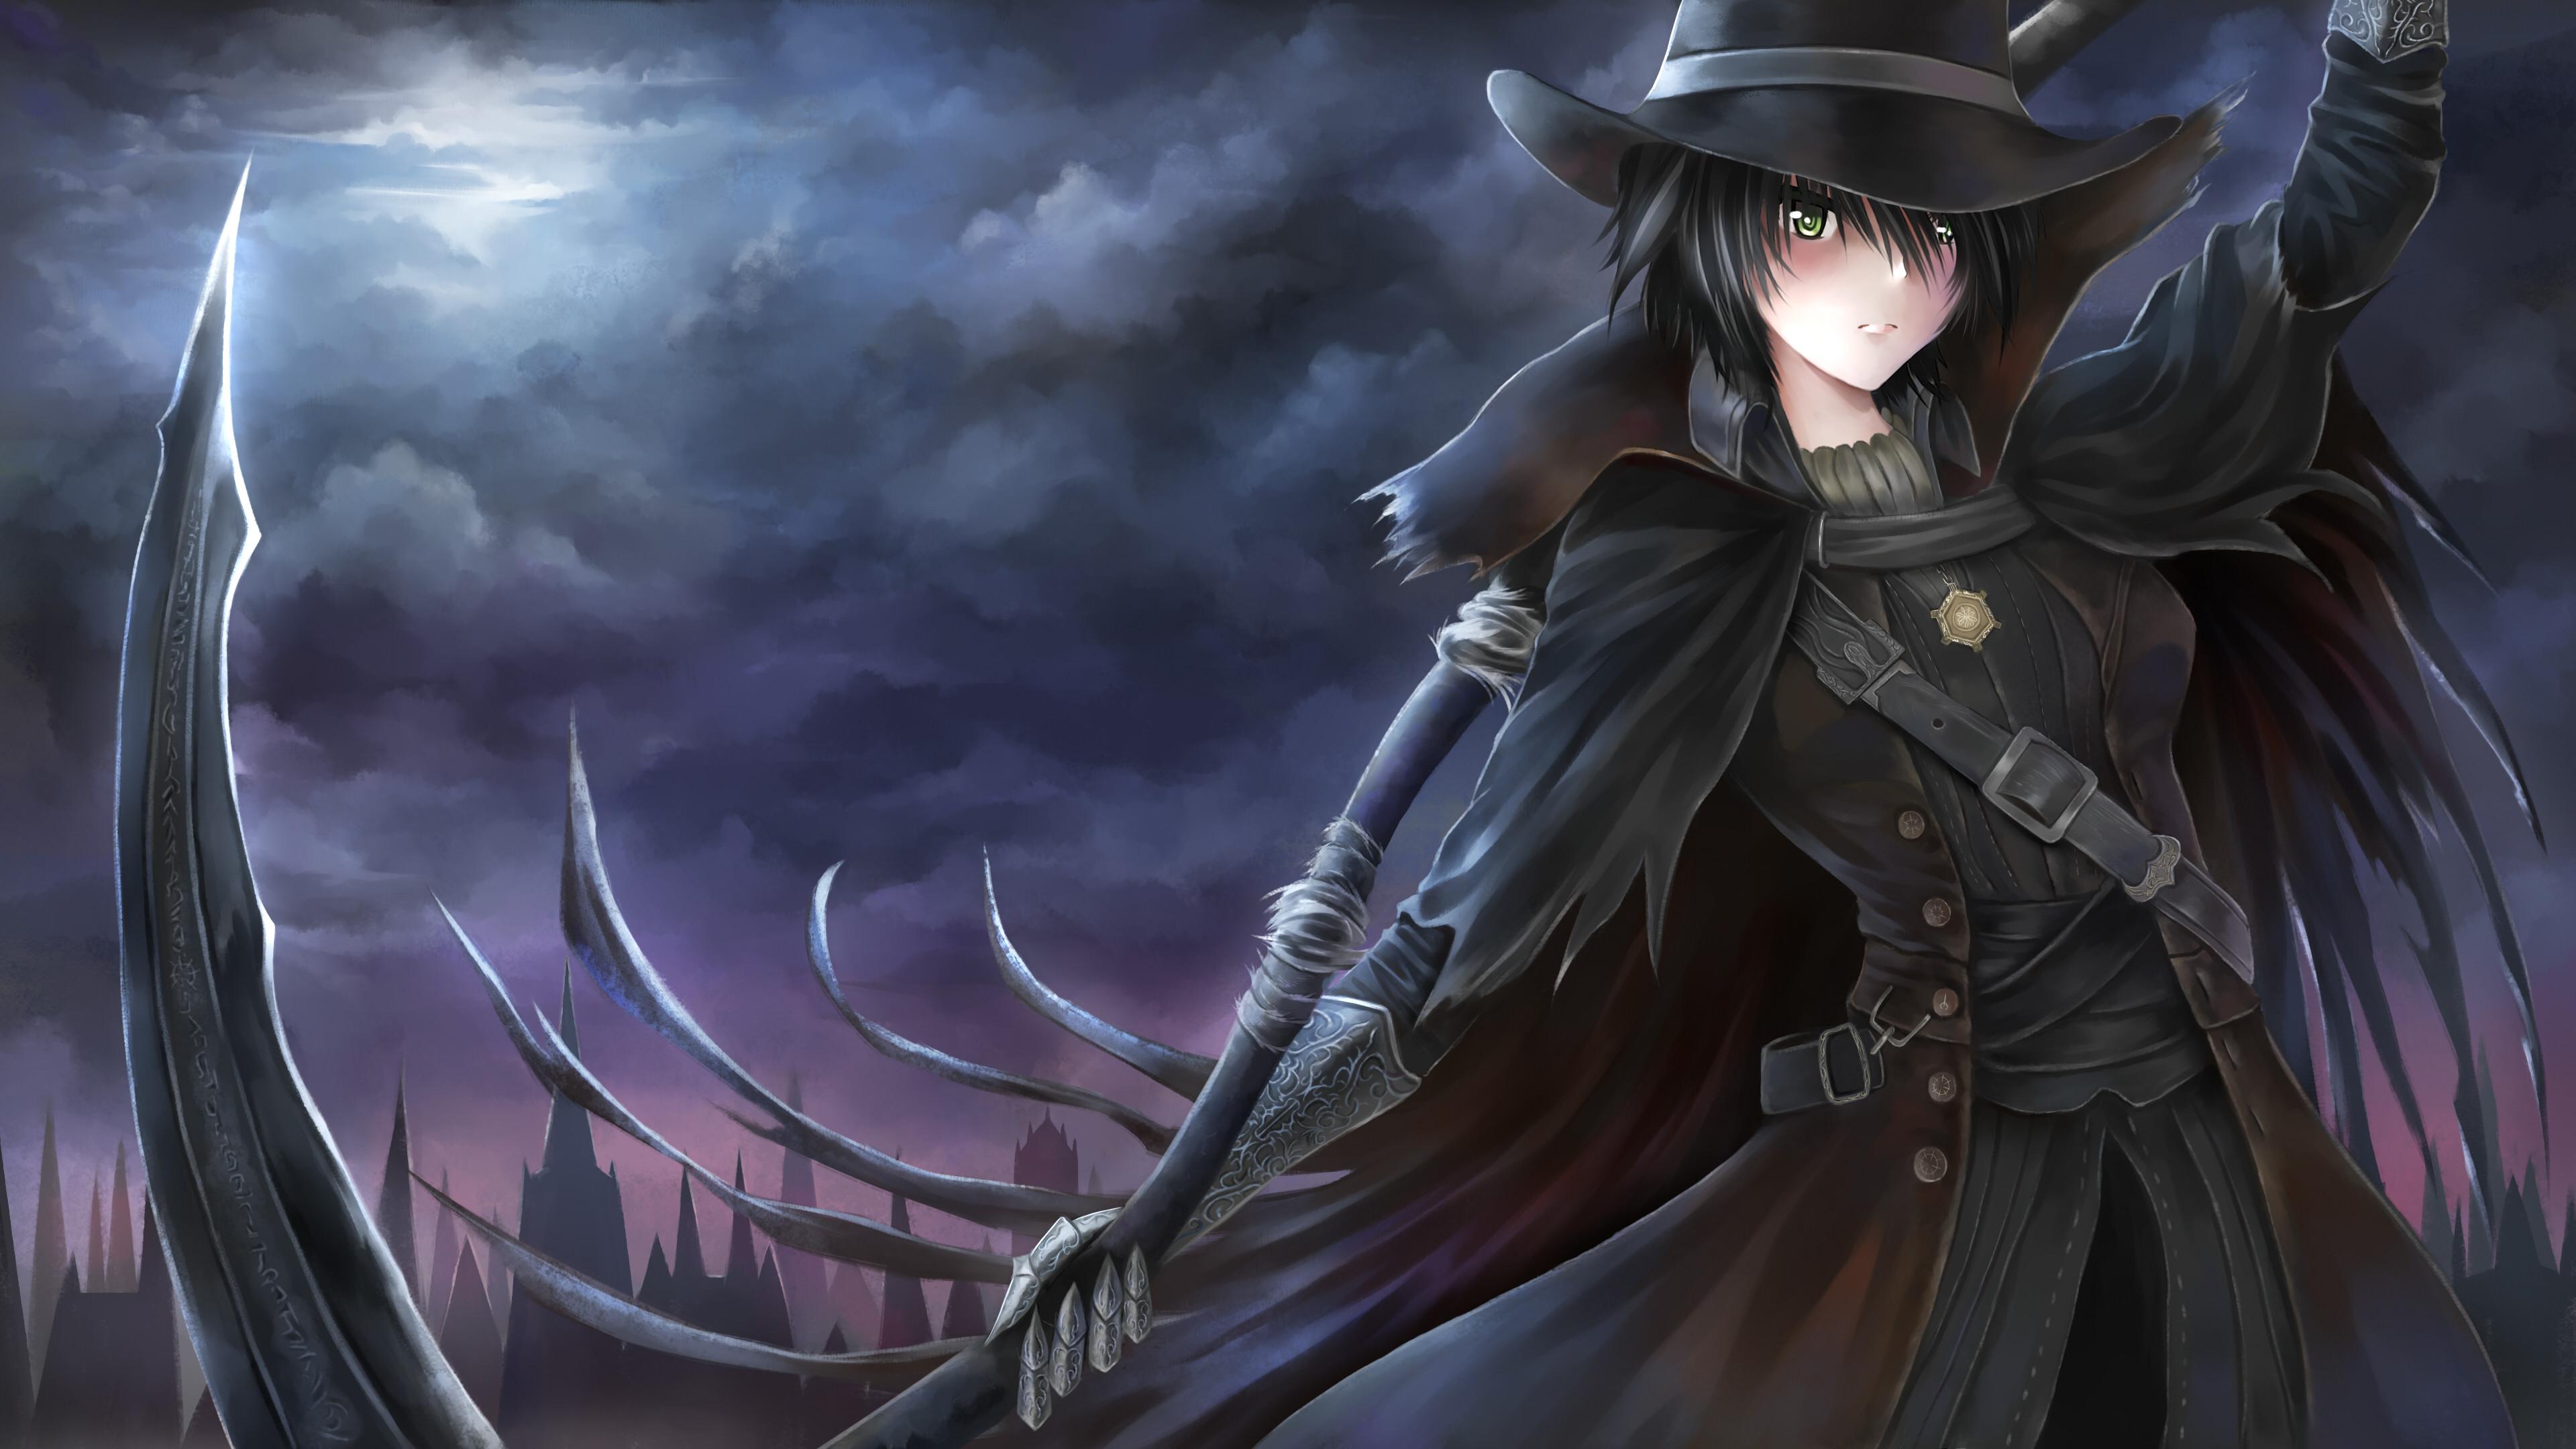 Res: 3840x2160, Bloodborne Anime Wallpaper